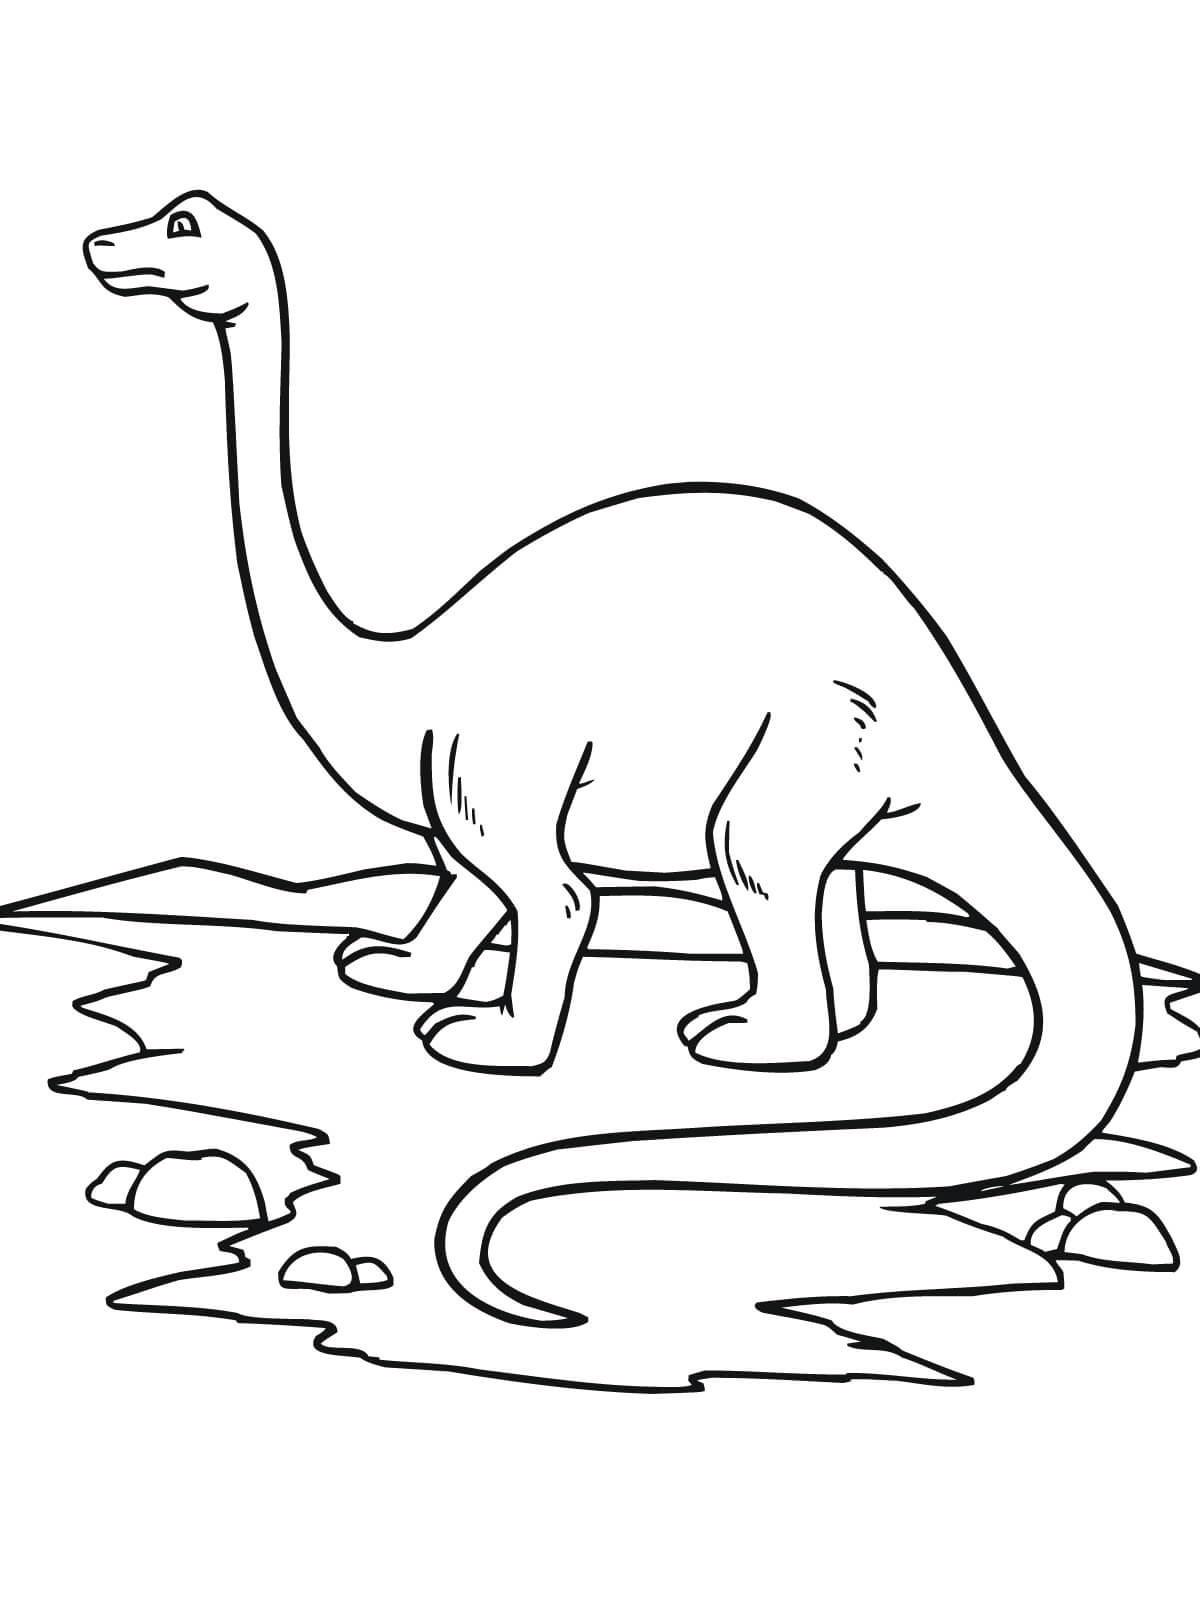 dinosaurios para colorear 3 brontosaurio